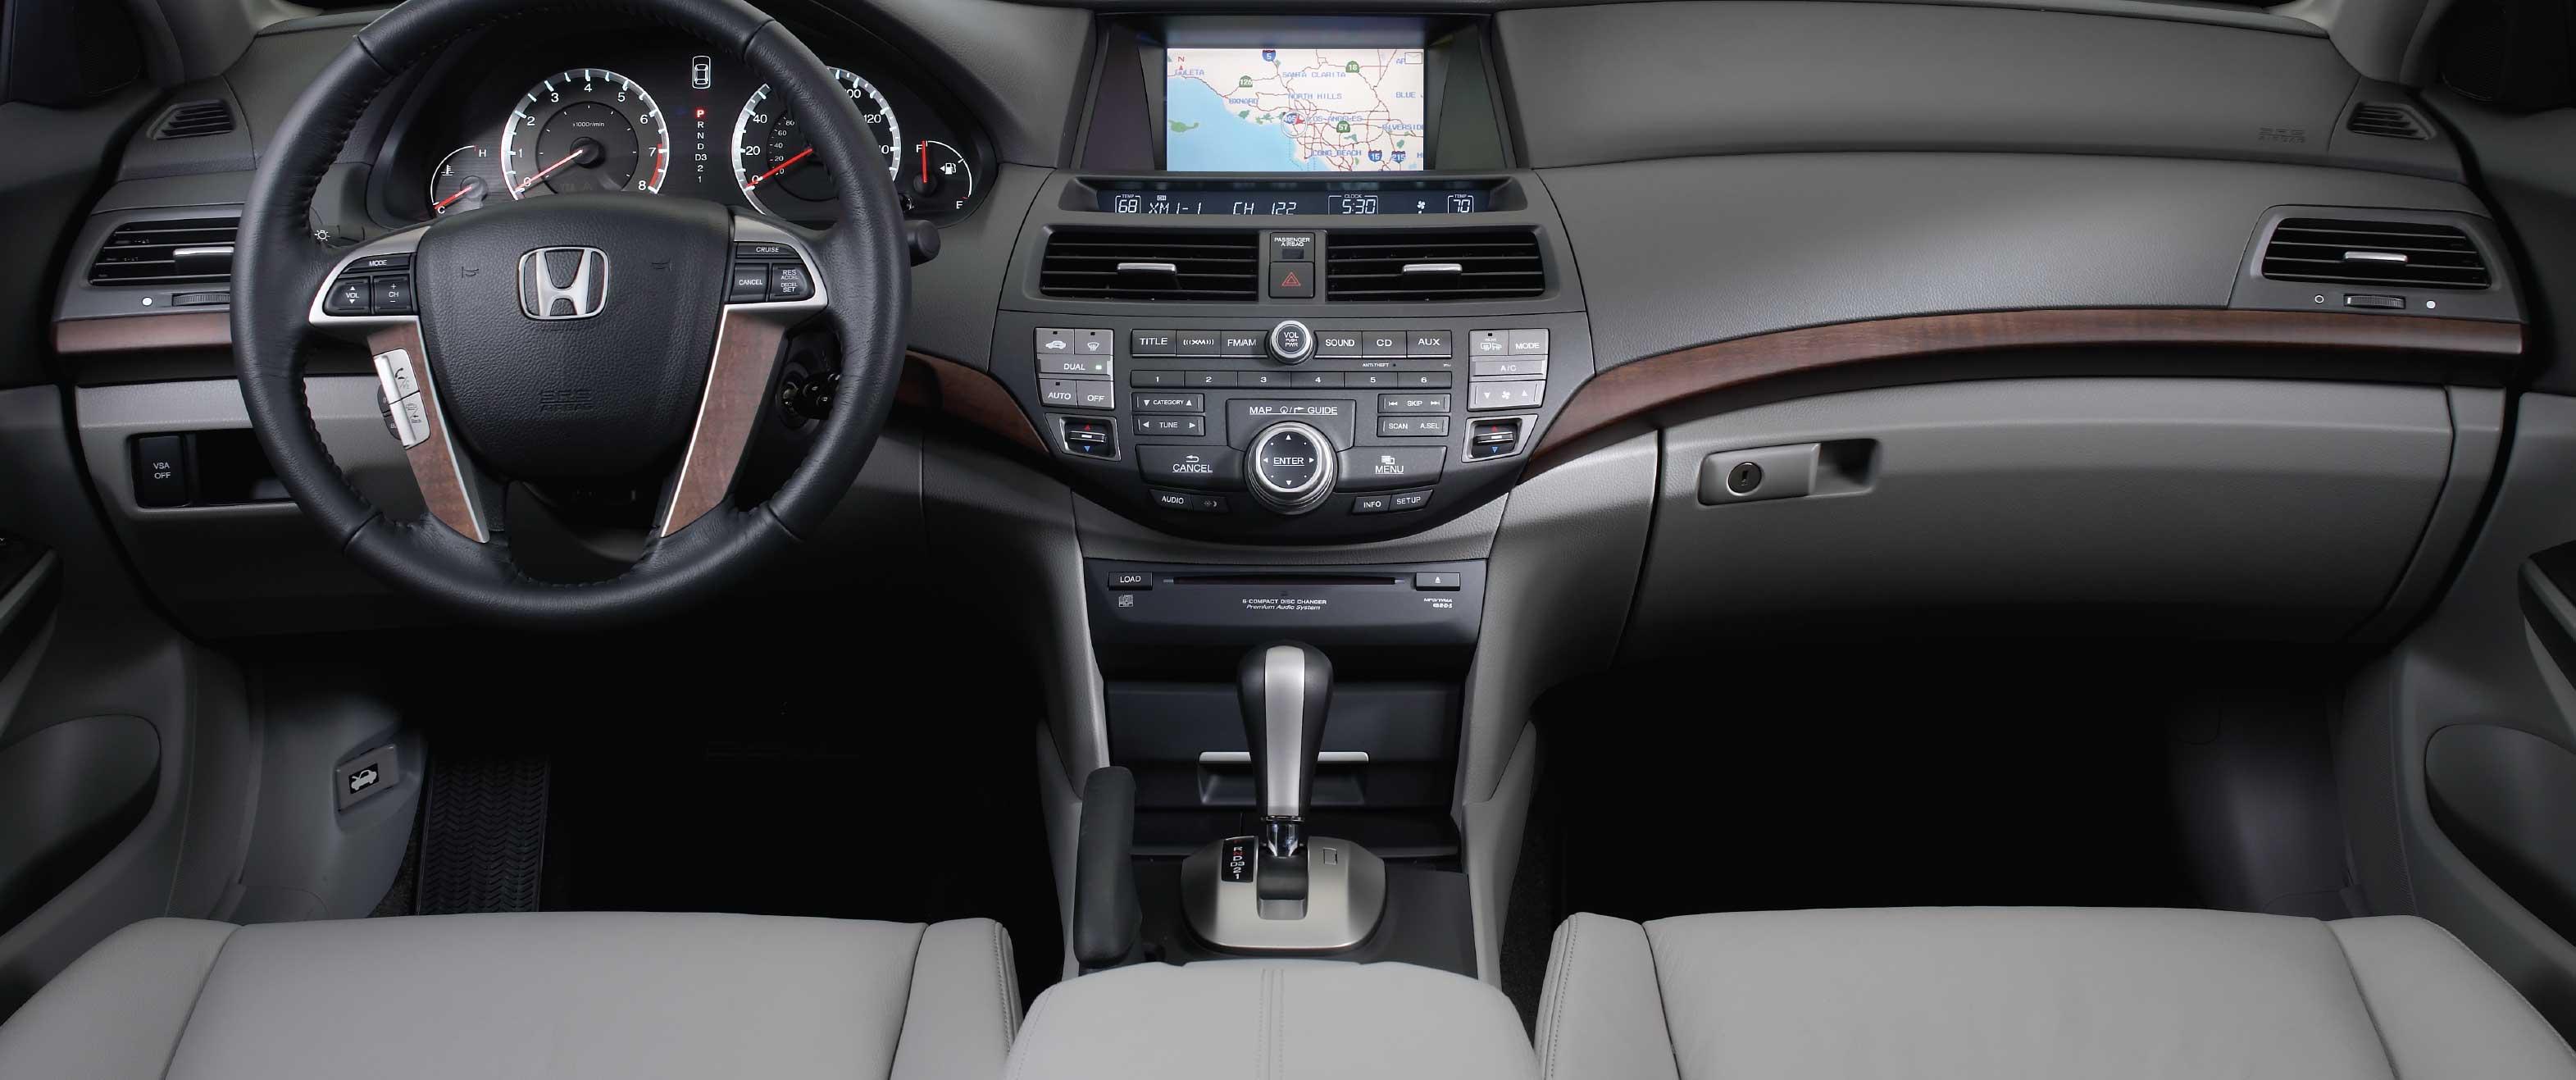 Interior Trim Kit 2008 Accord Sedan 15708